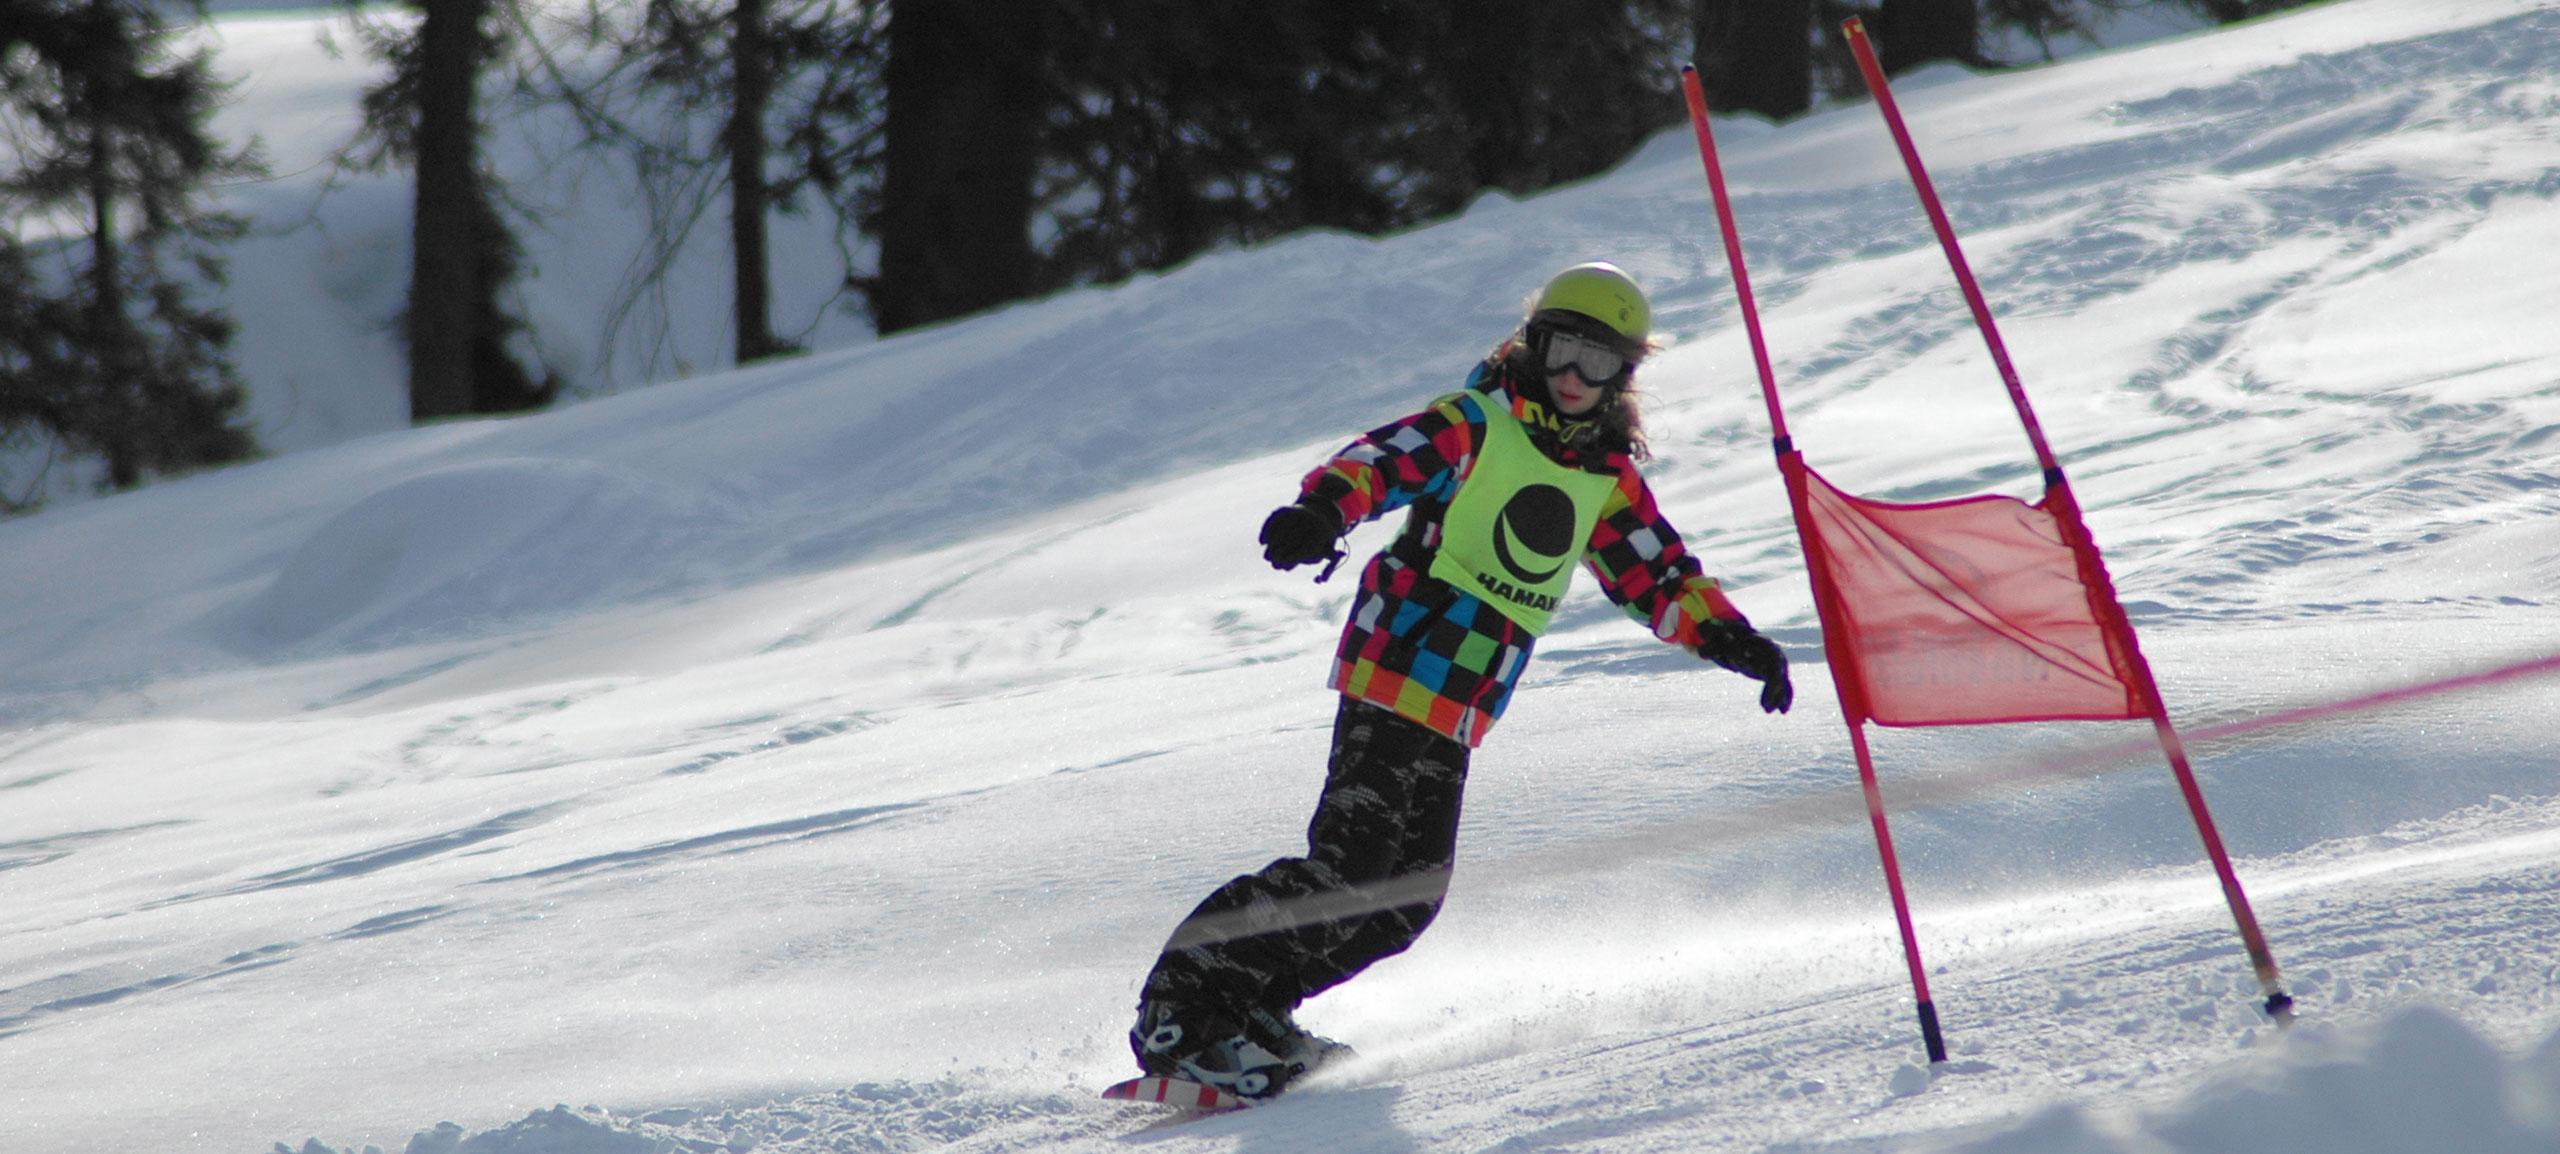 POLSKA – HAMAK SNOWBOARD CAMP – 2020